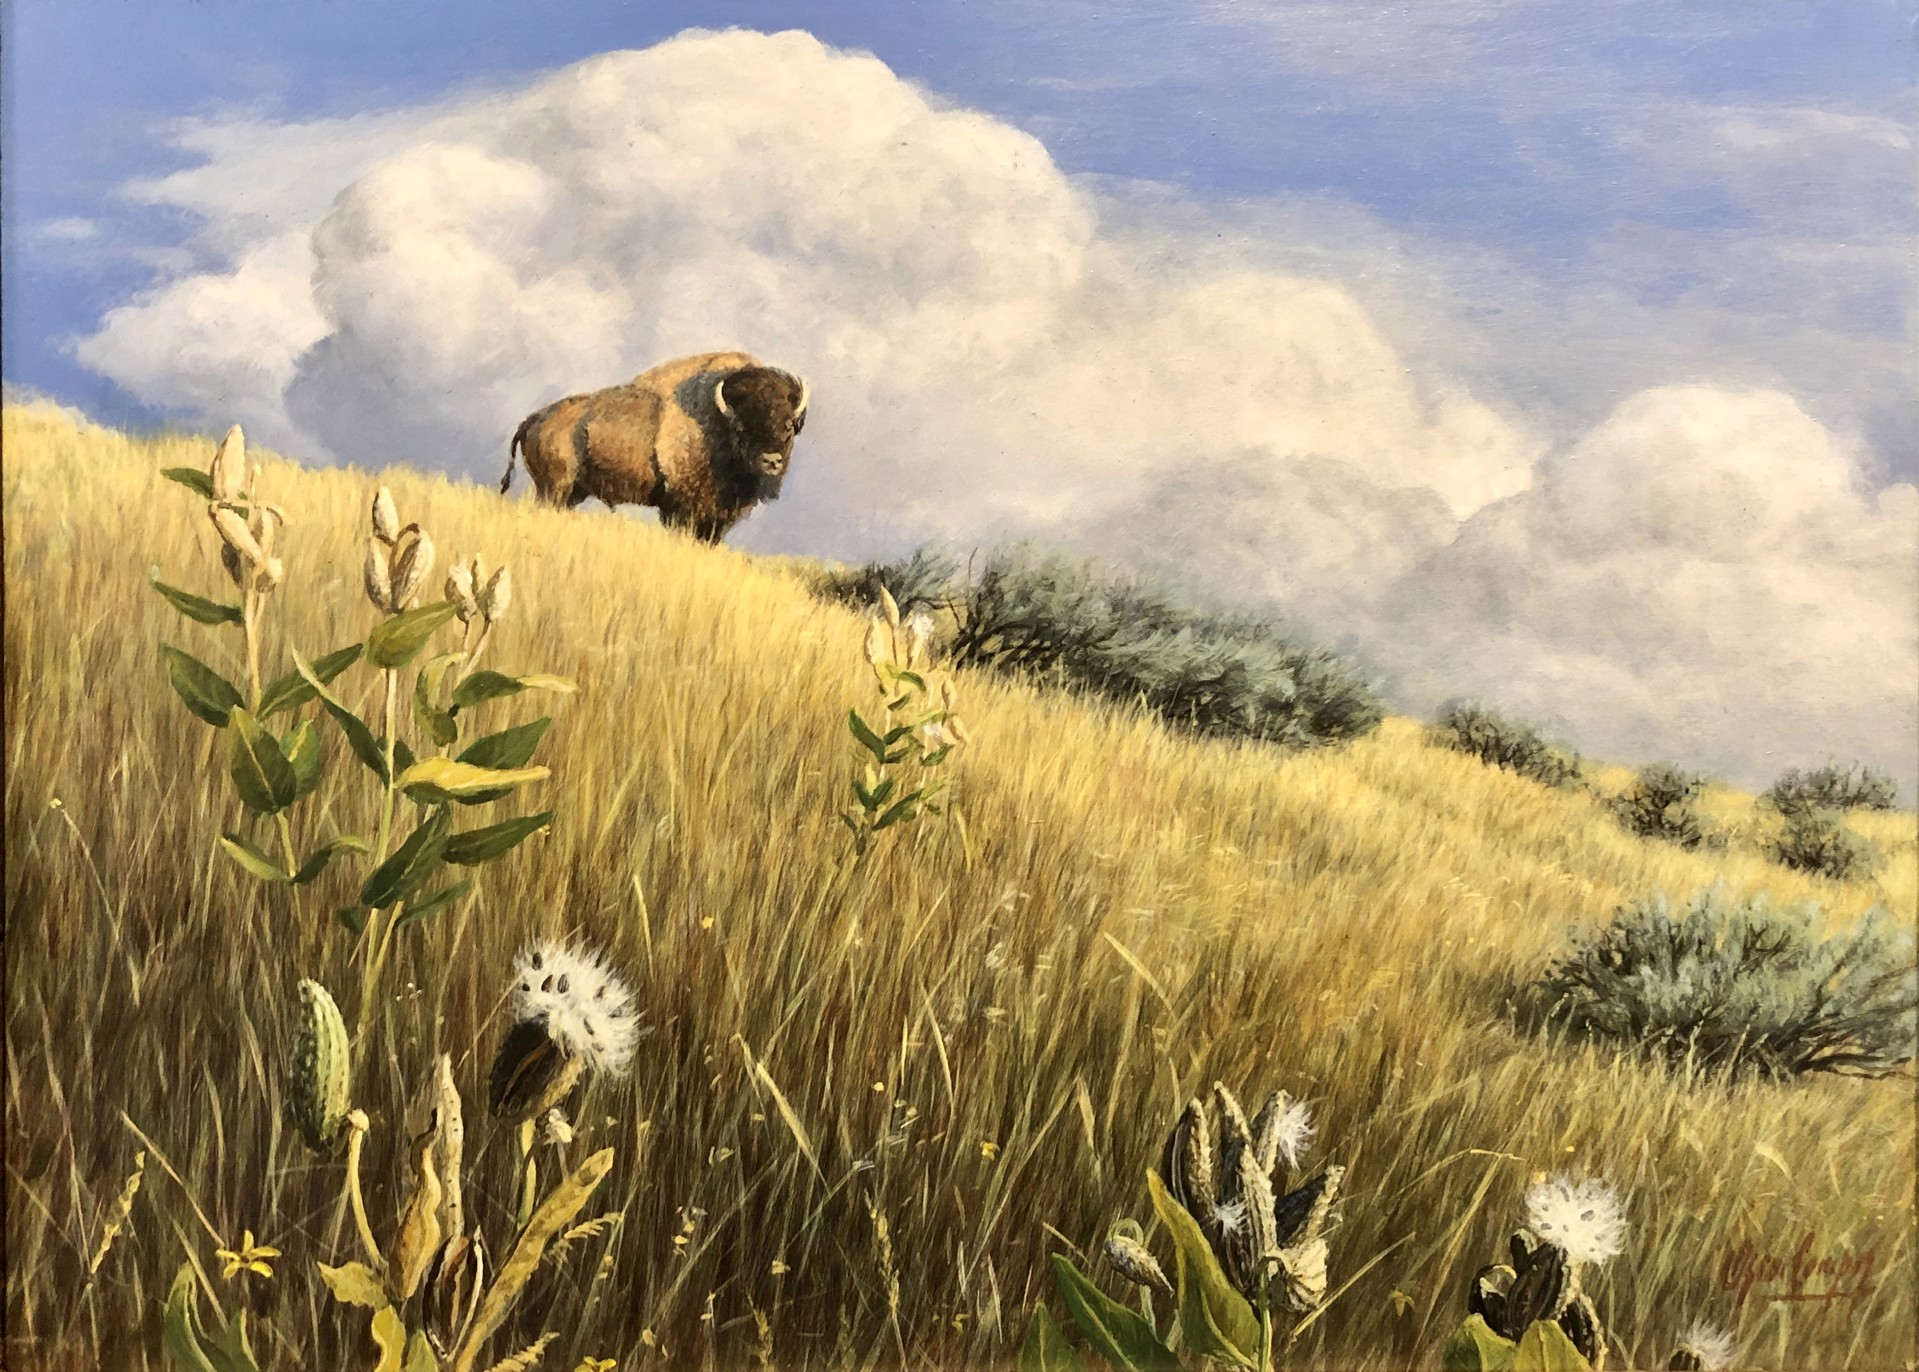 King of the Prairie by Oscar Campos